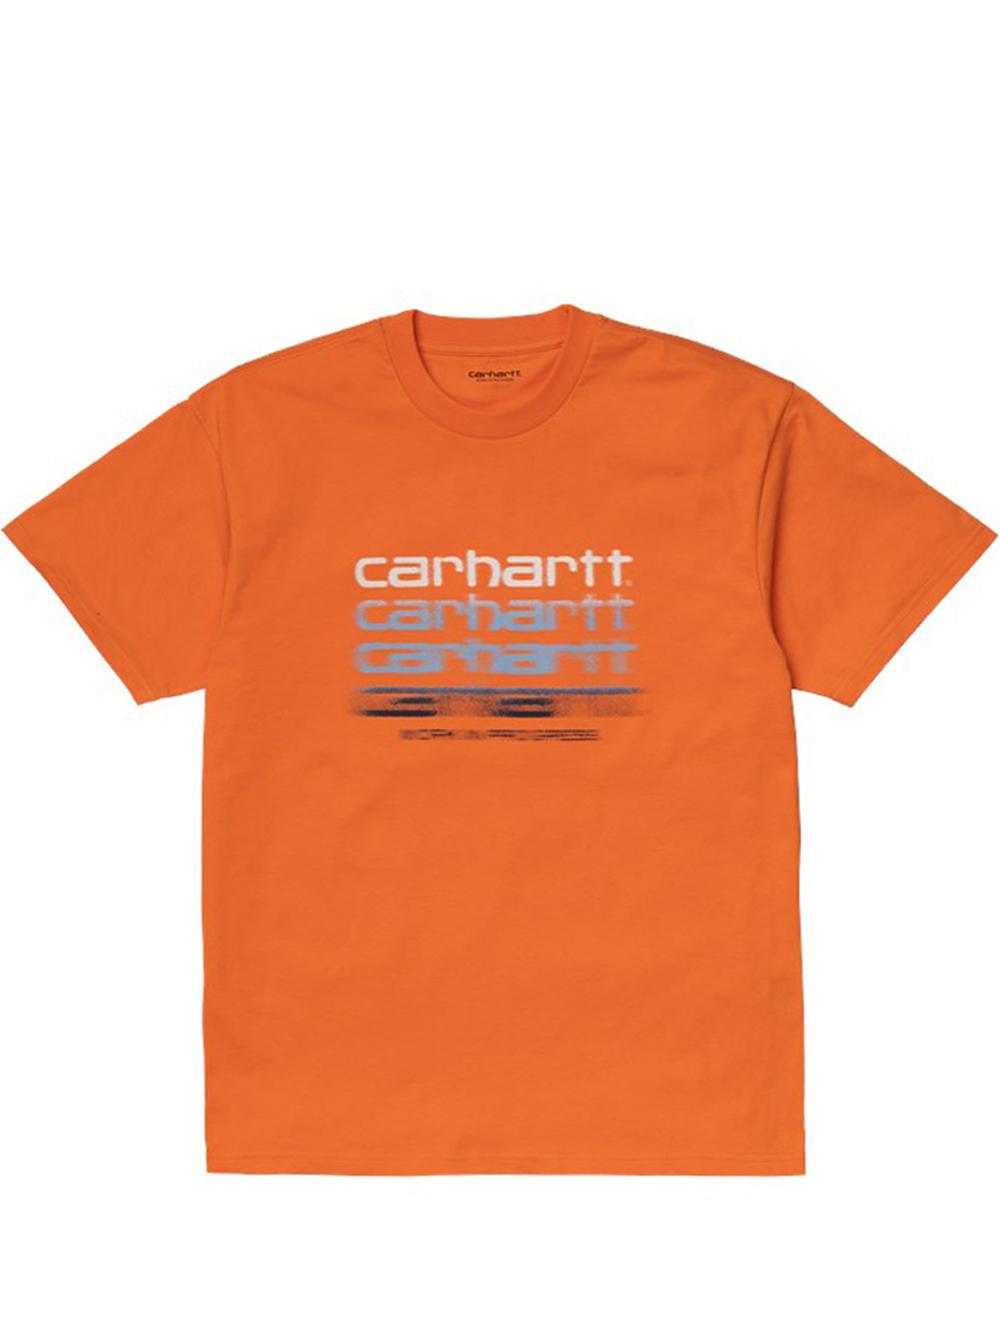 LOGO T-SHIRT CARHARTT WIP | T-shirts | I0290130AN.00